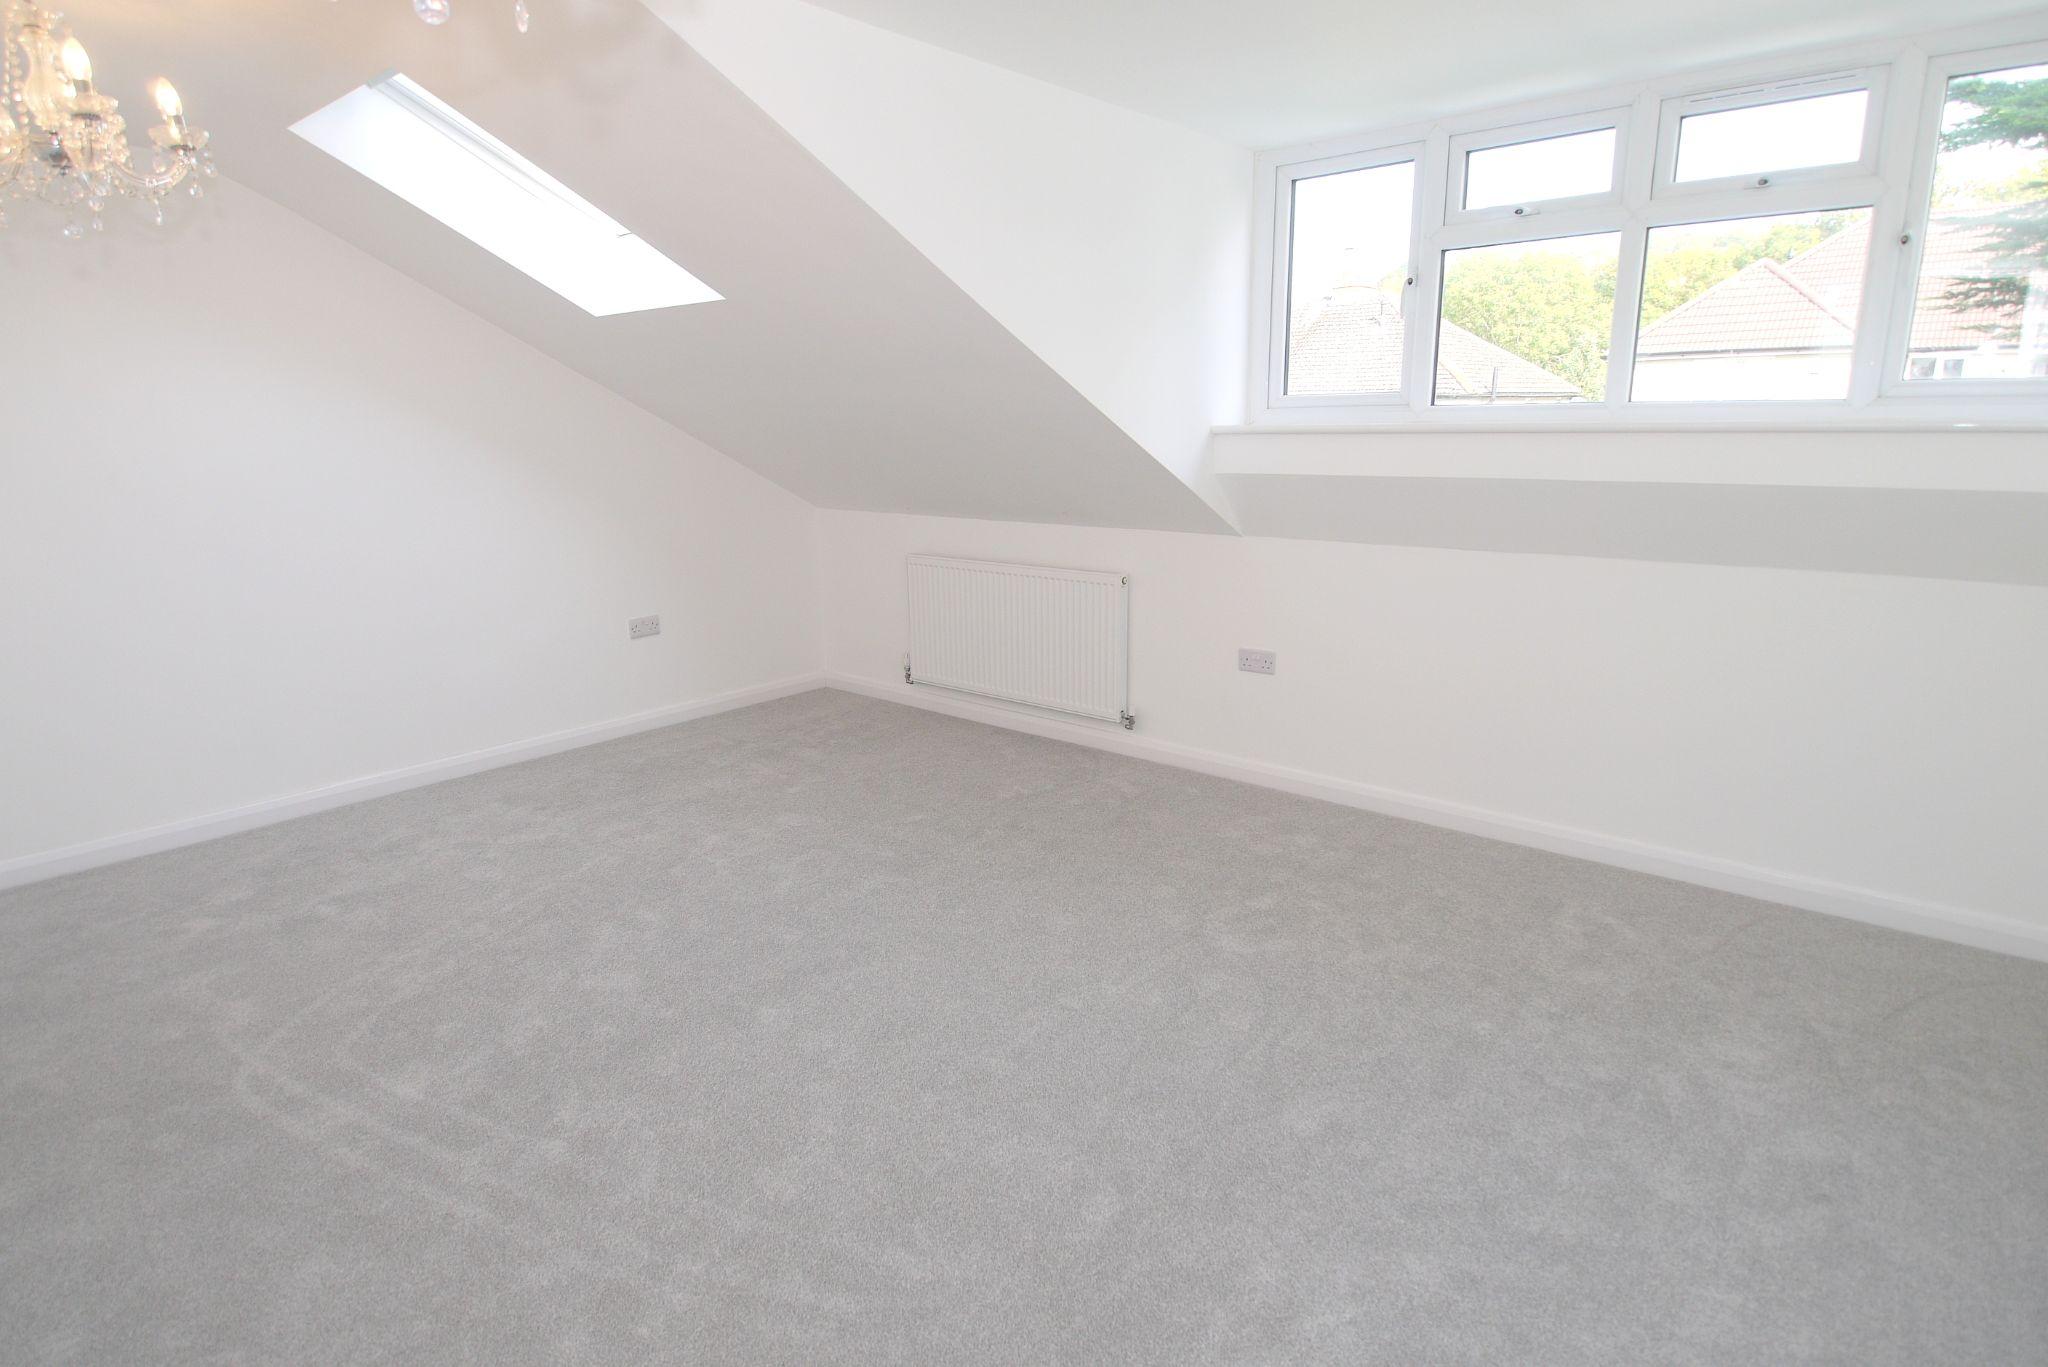 3 bedroom detached house Sold in Sevenoaks - Photograph 8